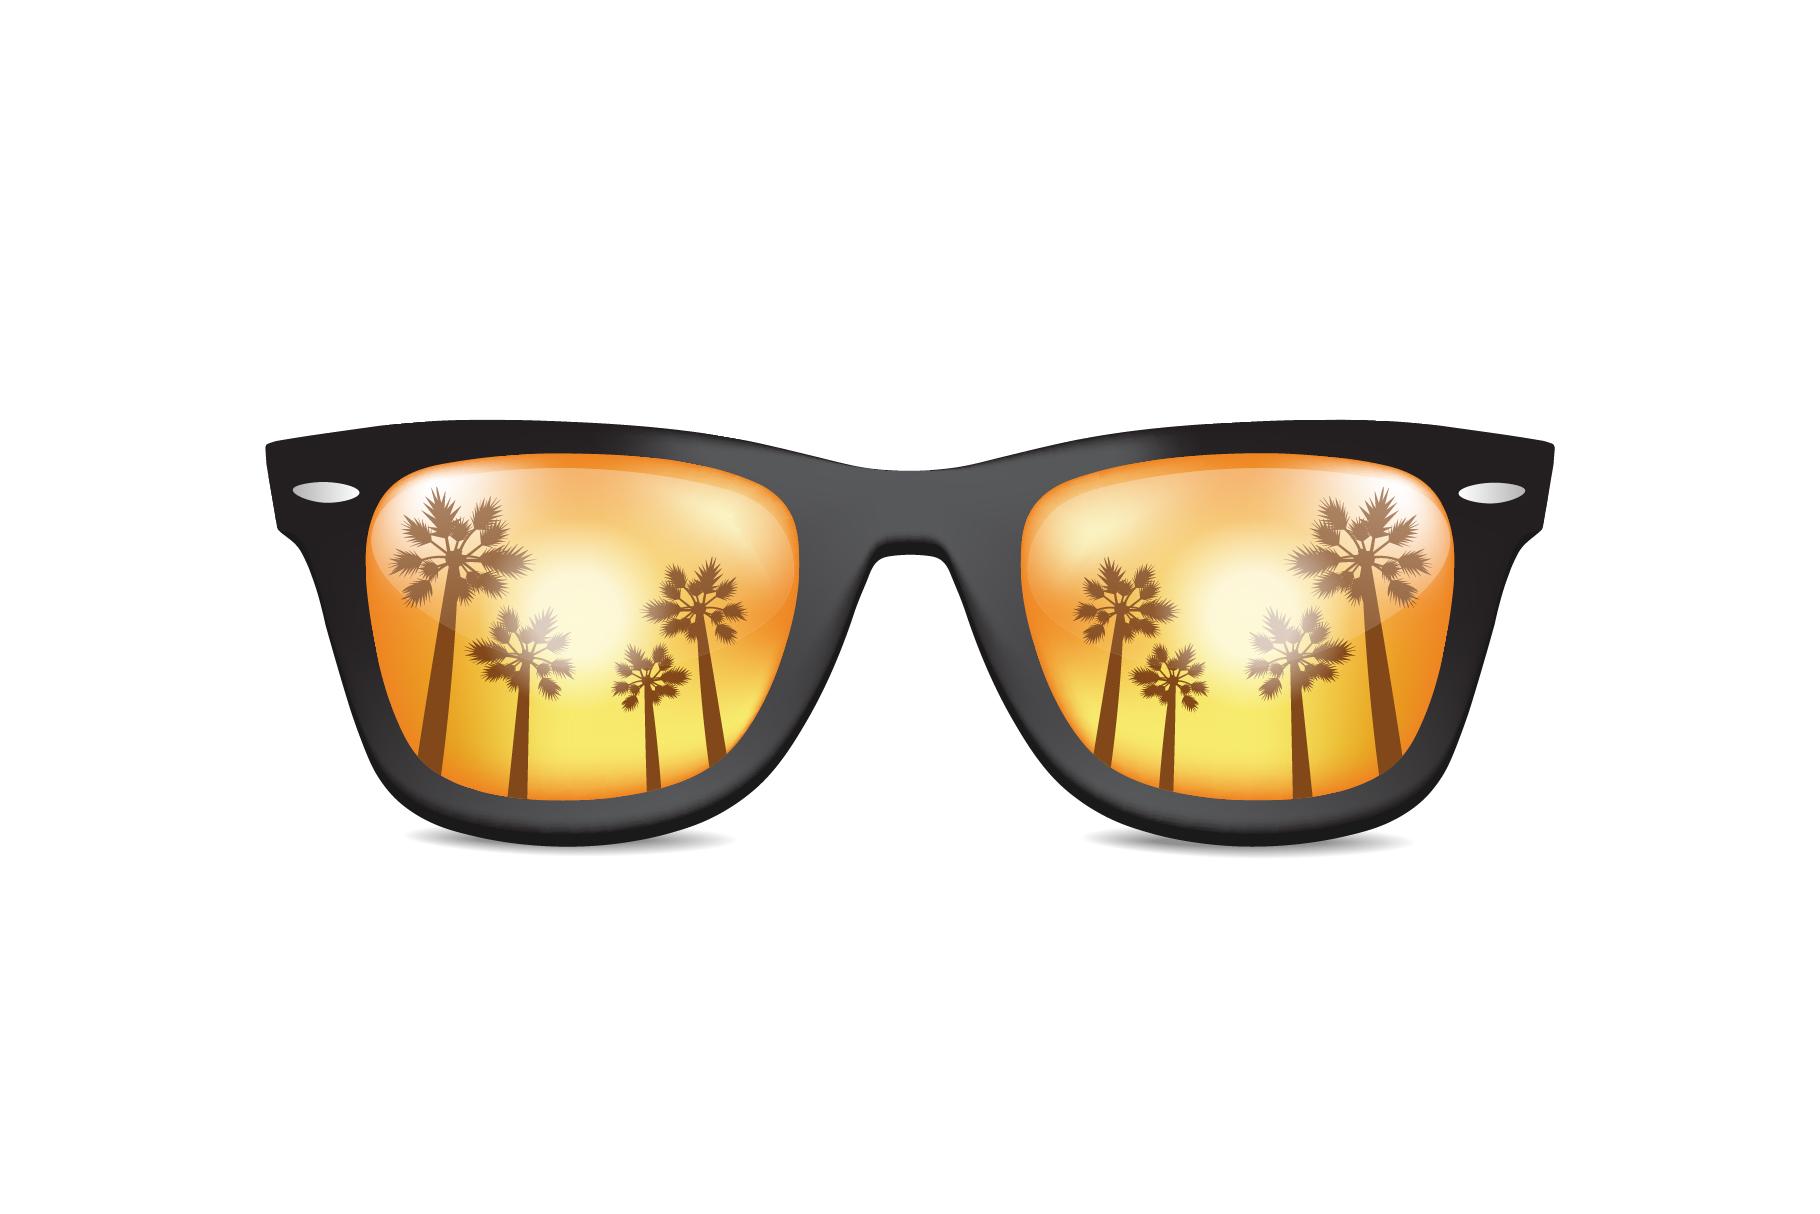 Realistic Sunglasses example image 1